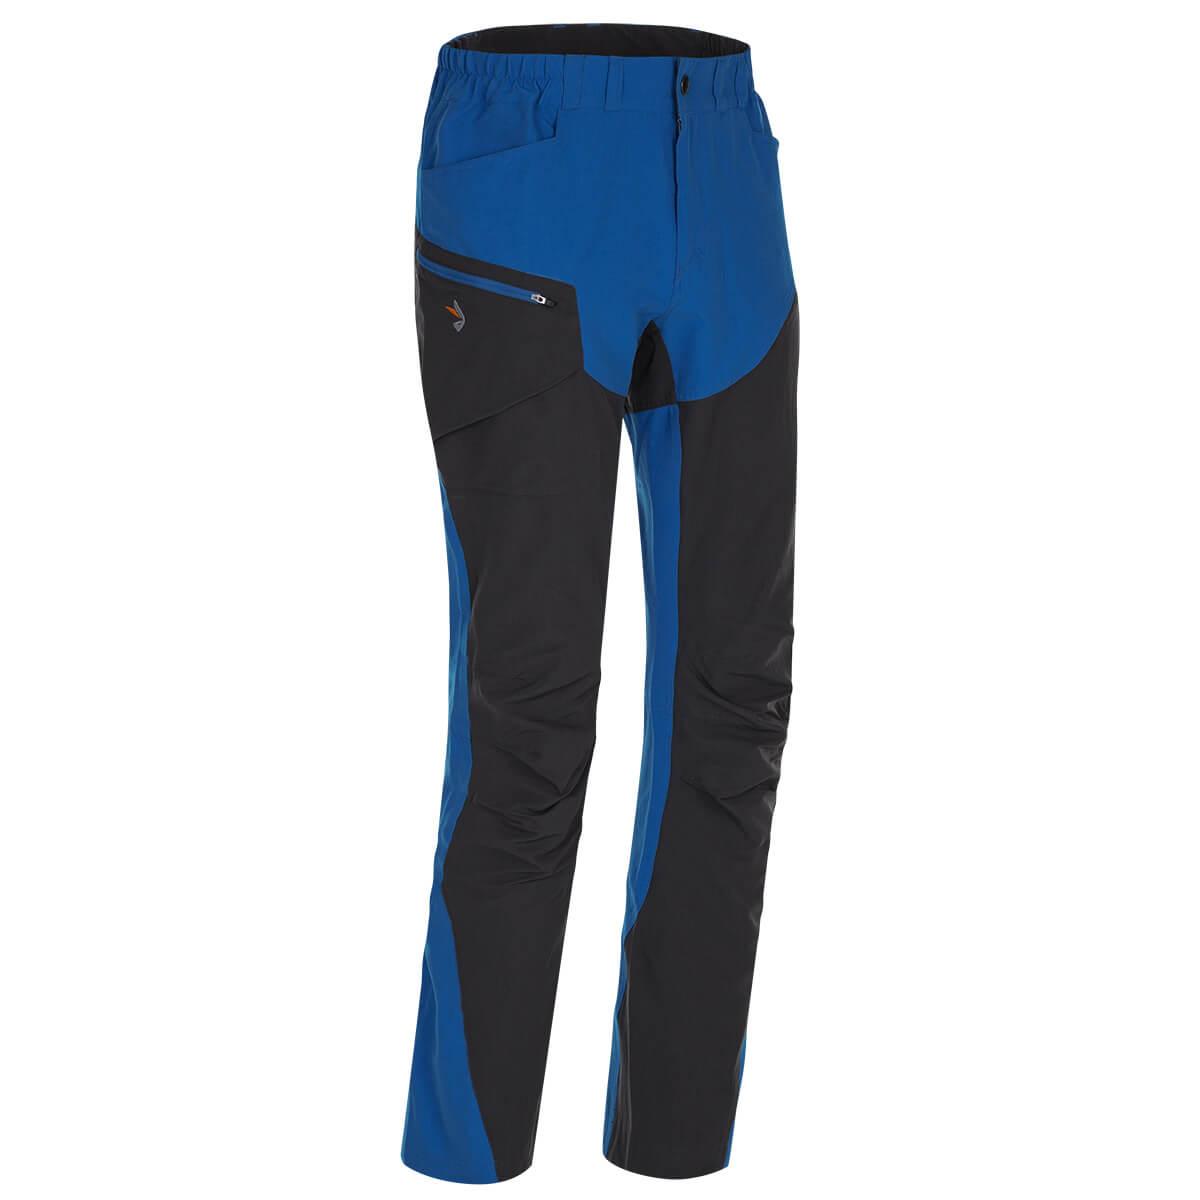 Nohavice Zajo Magnet Neo Pants Blue - veľkosť S